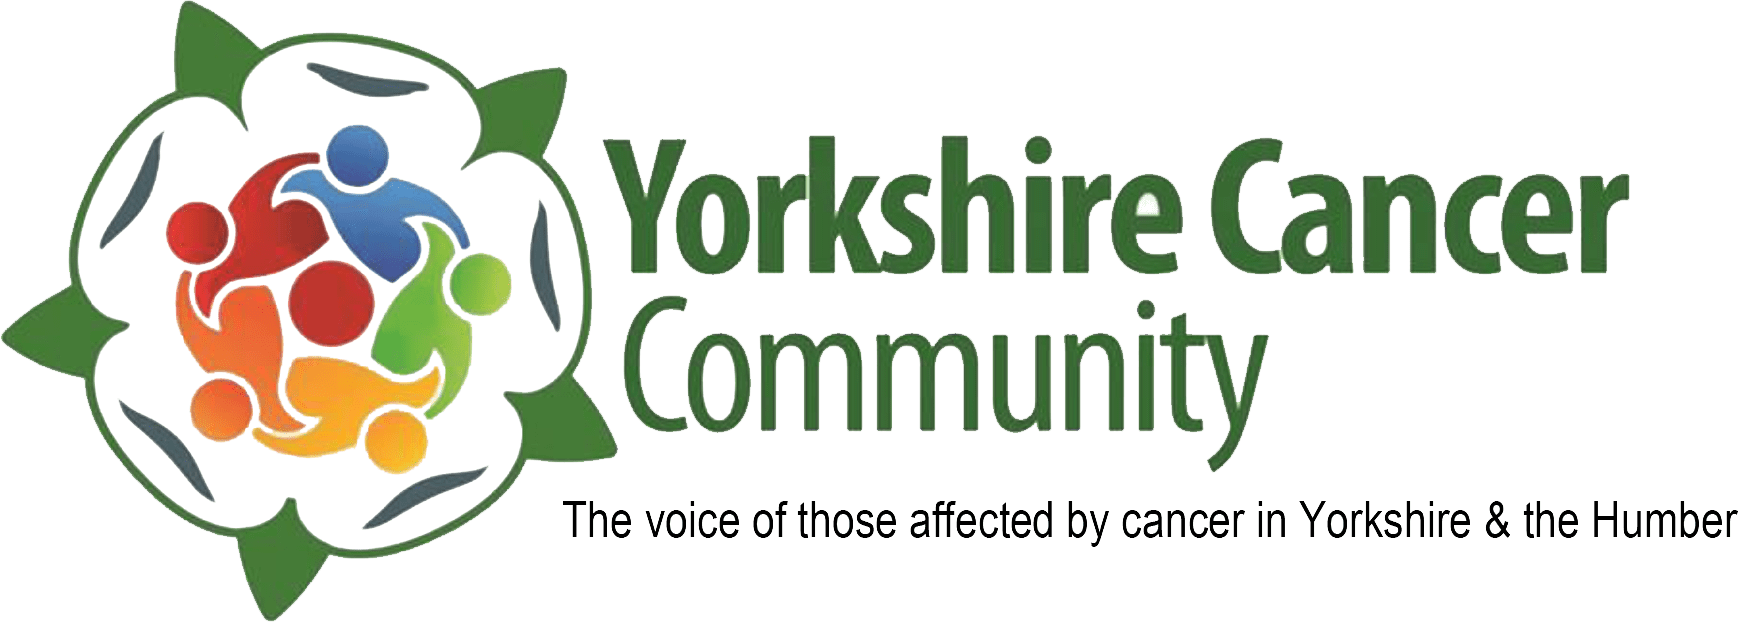 Yorkshire Cancer Community Logo